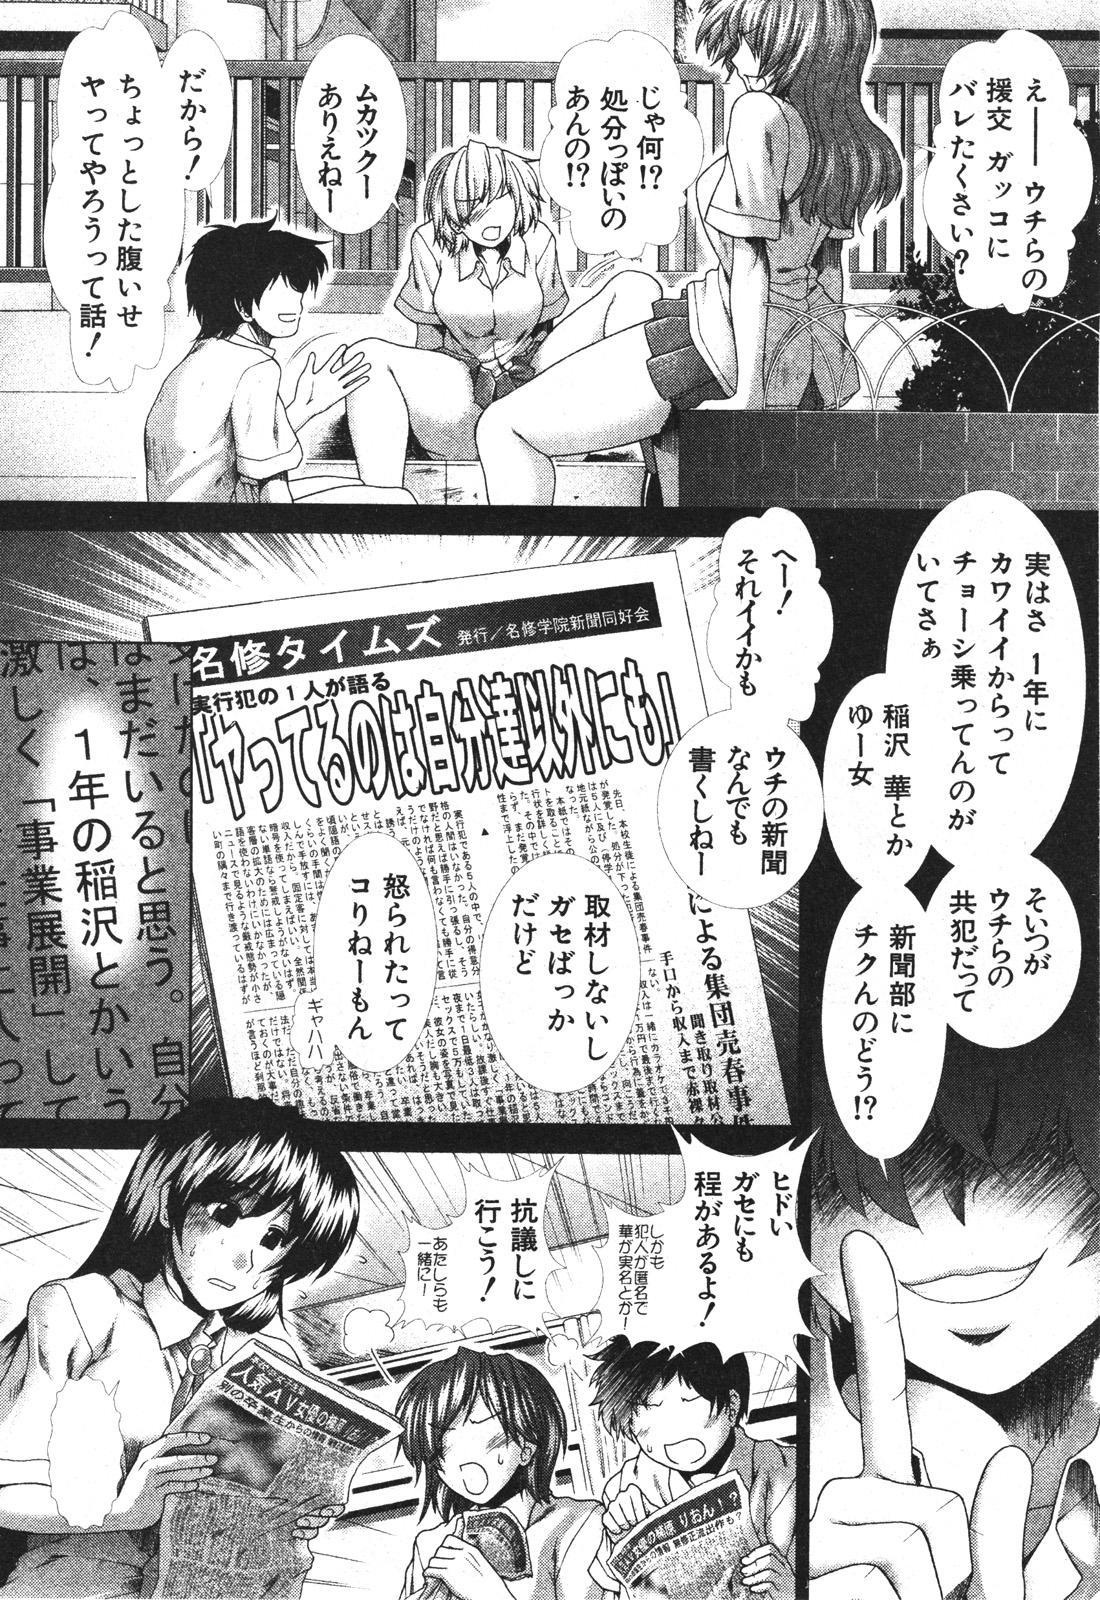 BUSTER COMIC 2010-05 Vol.07 221